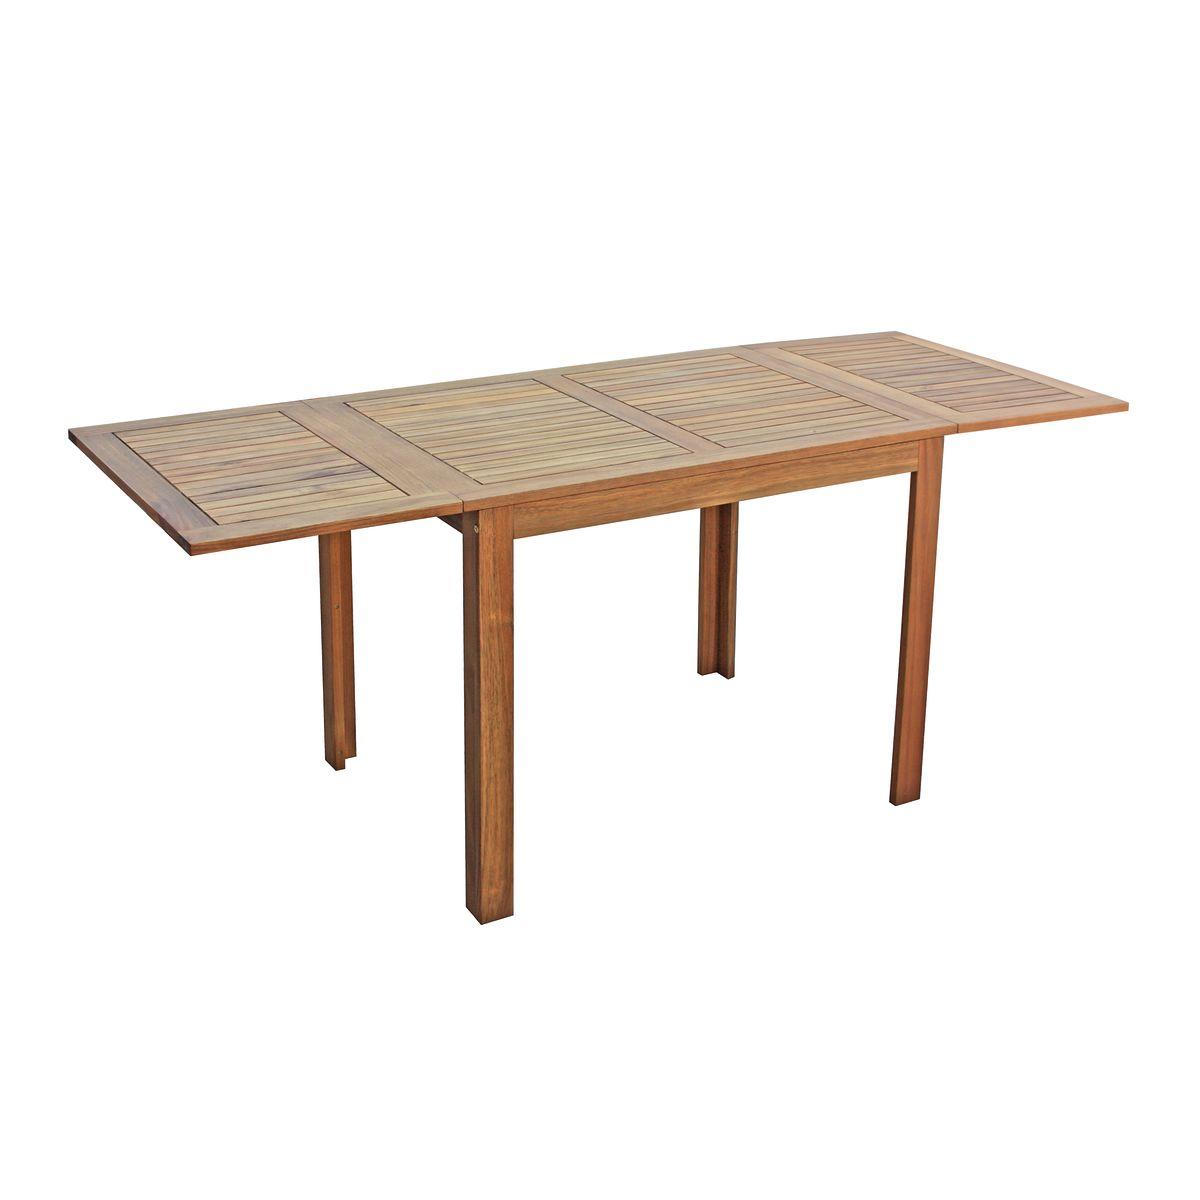 Ikea tavoli giardino allungabili - Tavolo giardino ikea ...